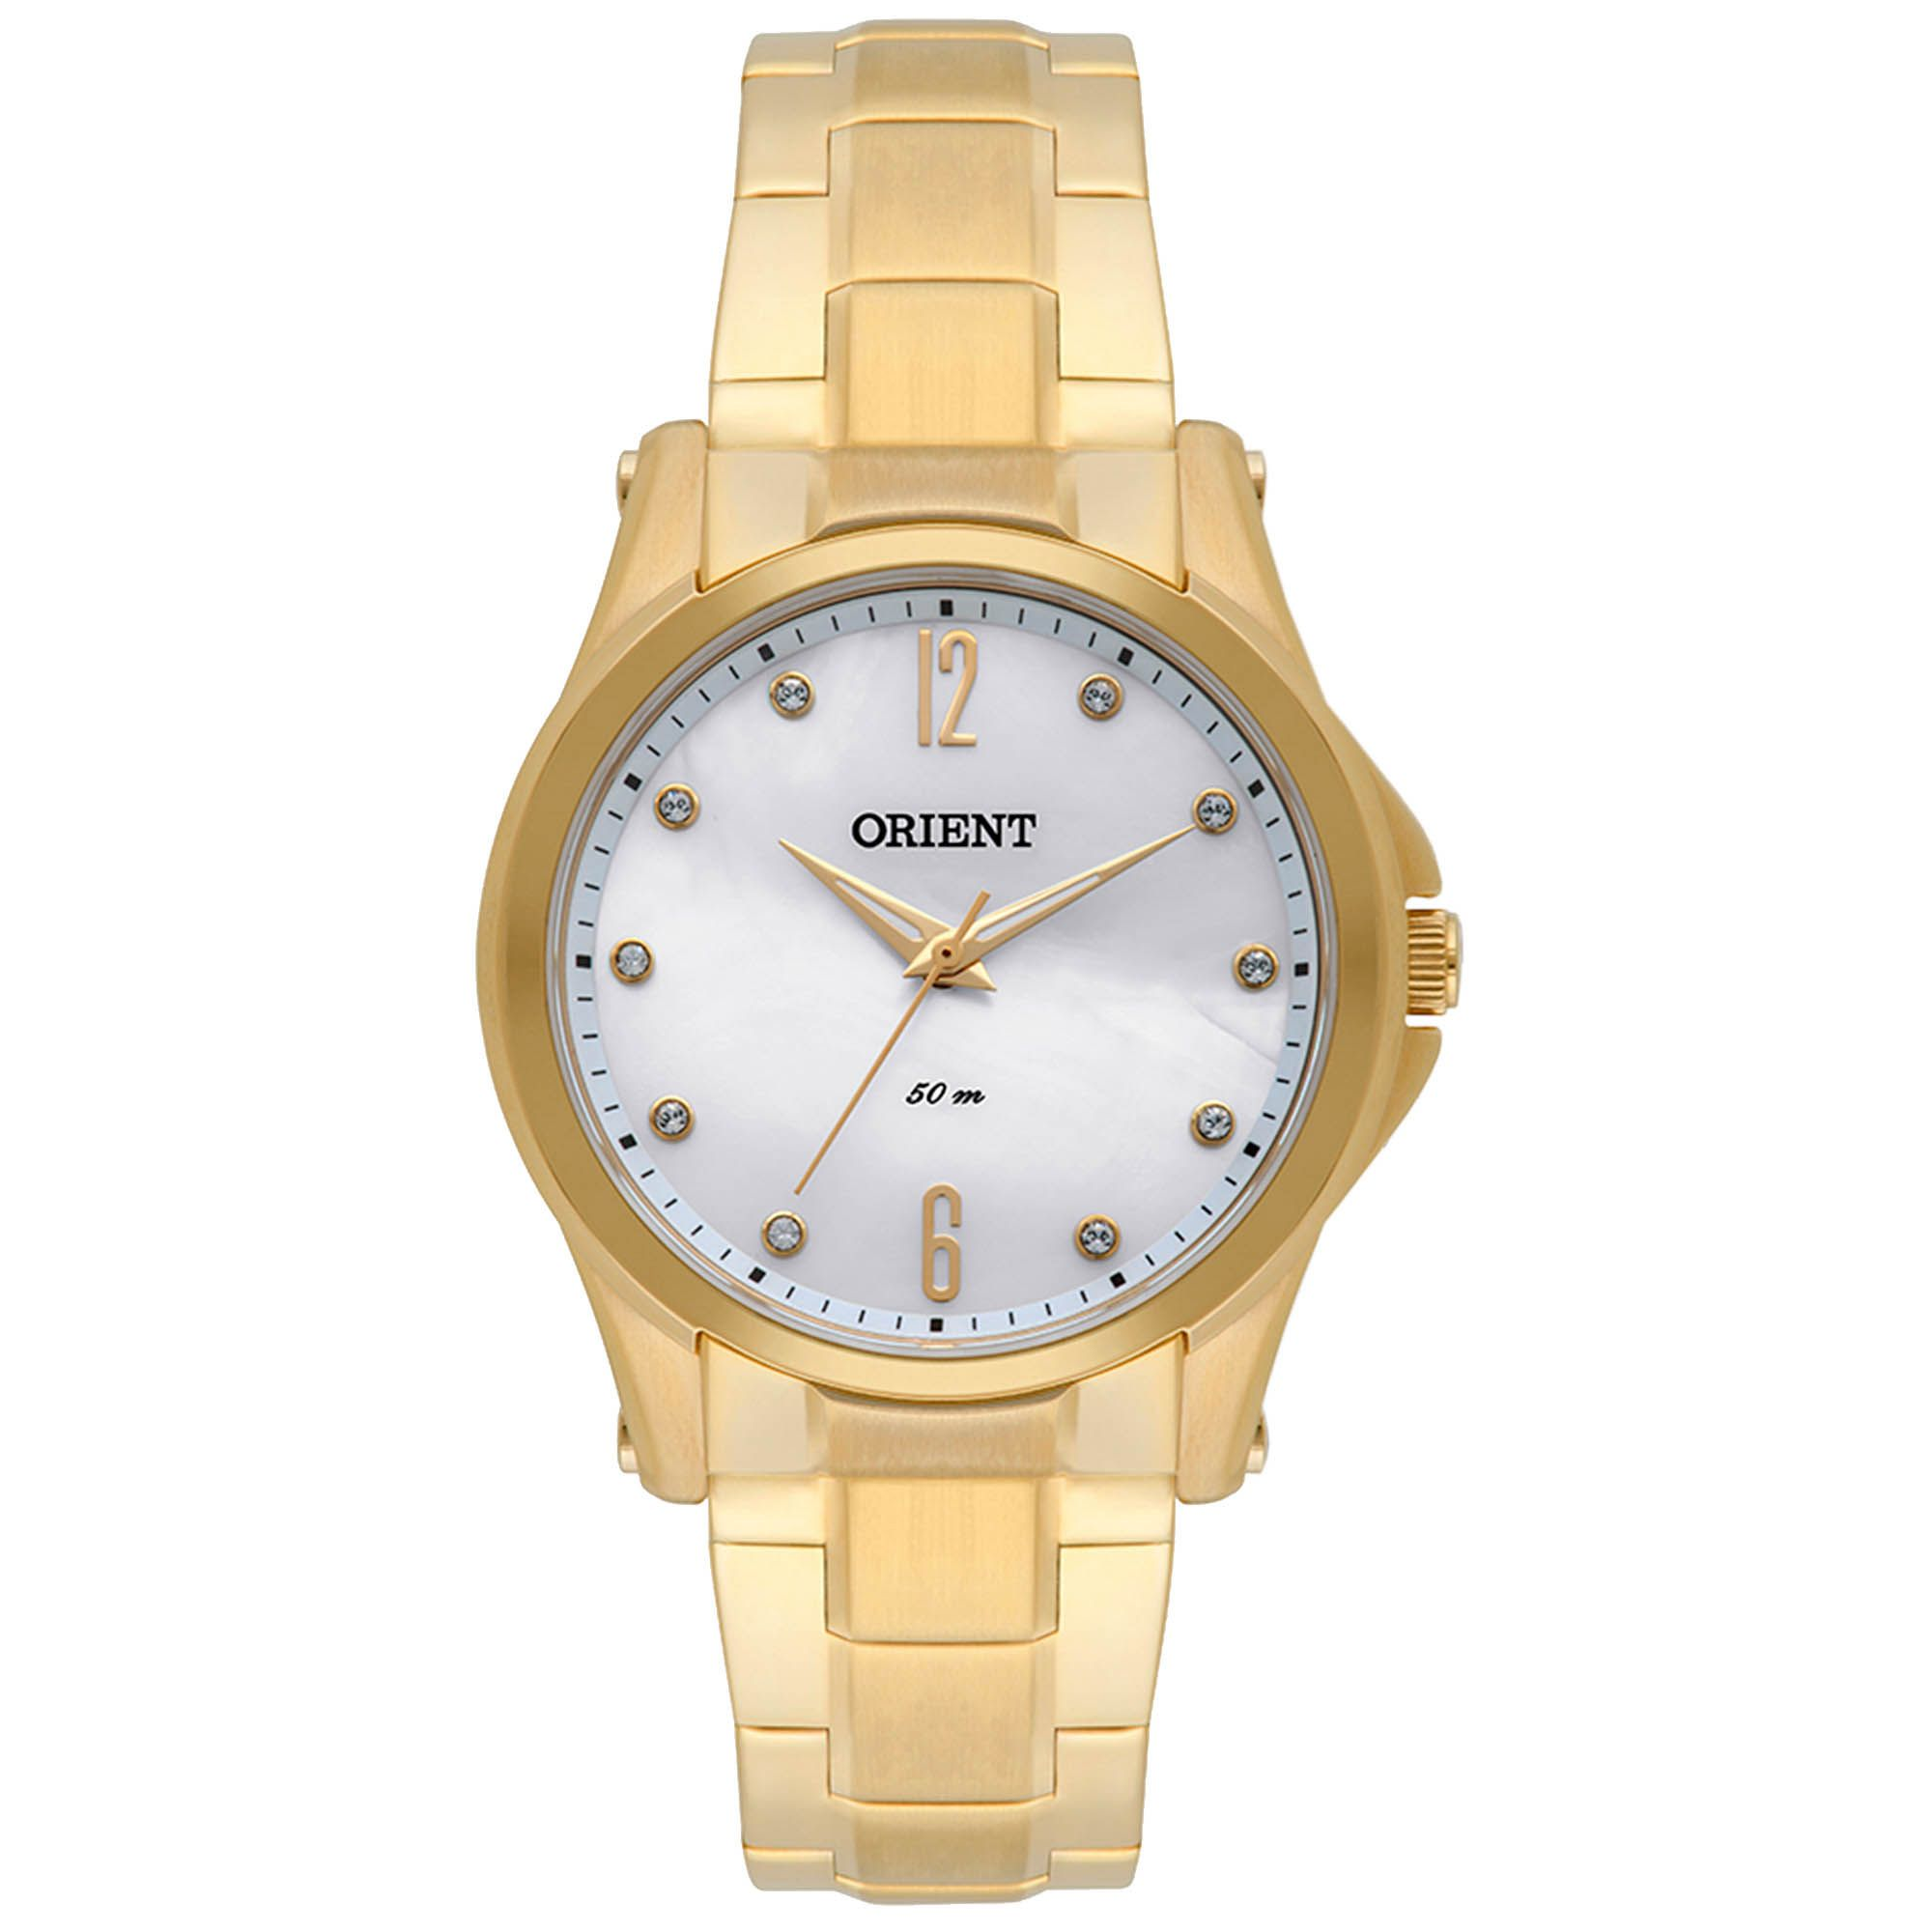 Relógio Feminino Orient FGSS0063 B2KX